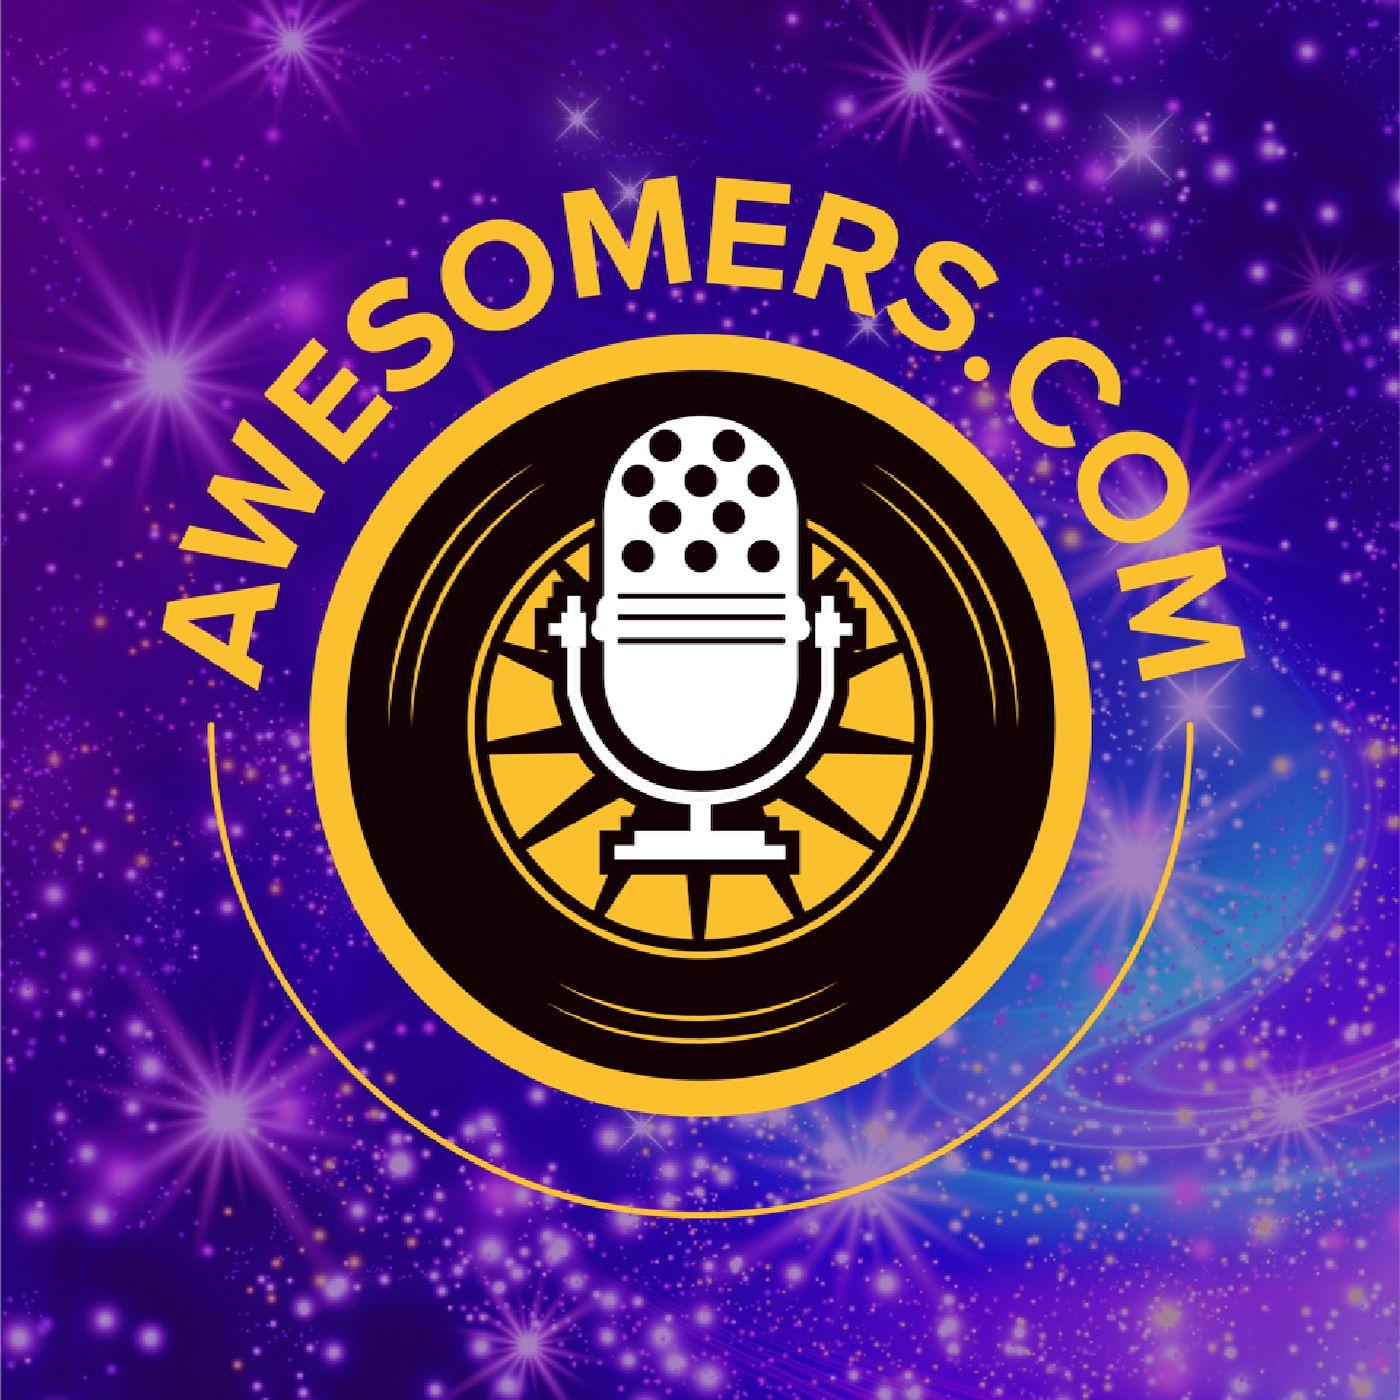 Awesomers.com